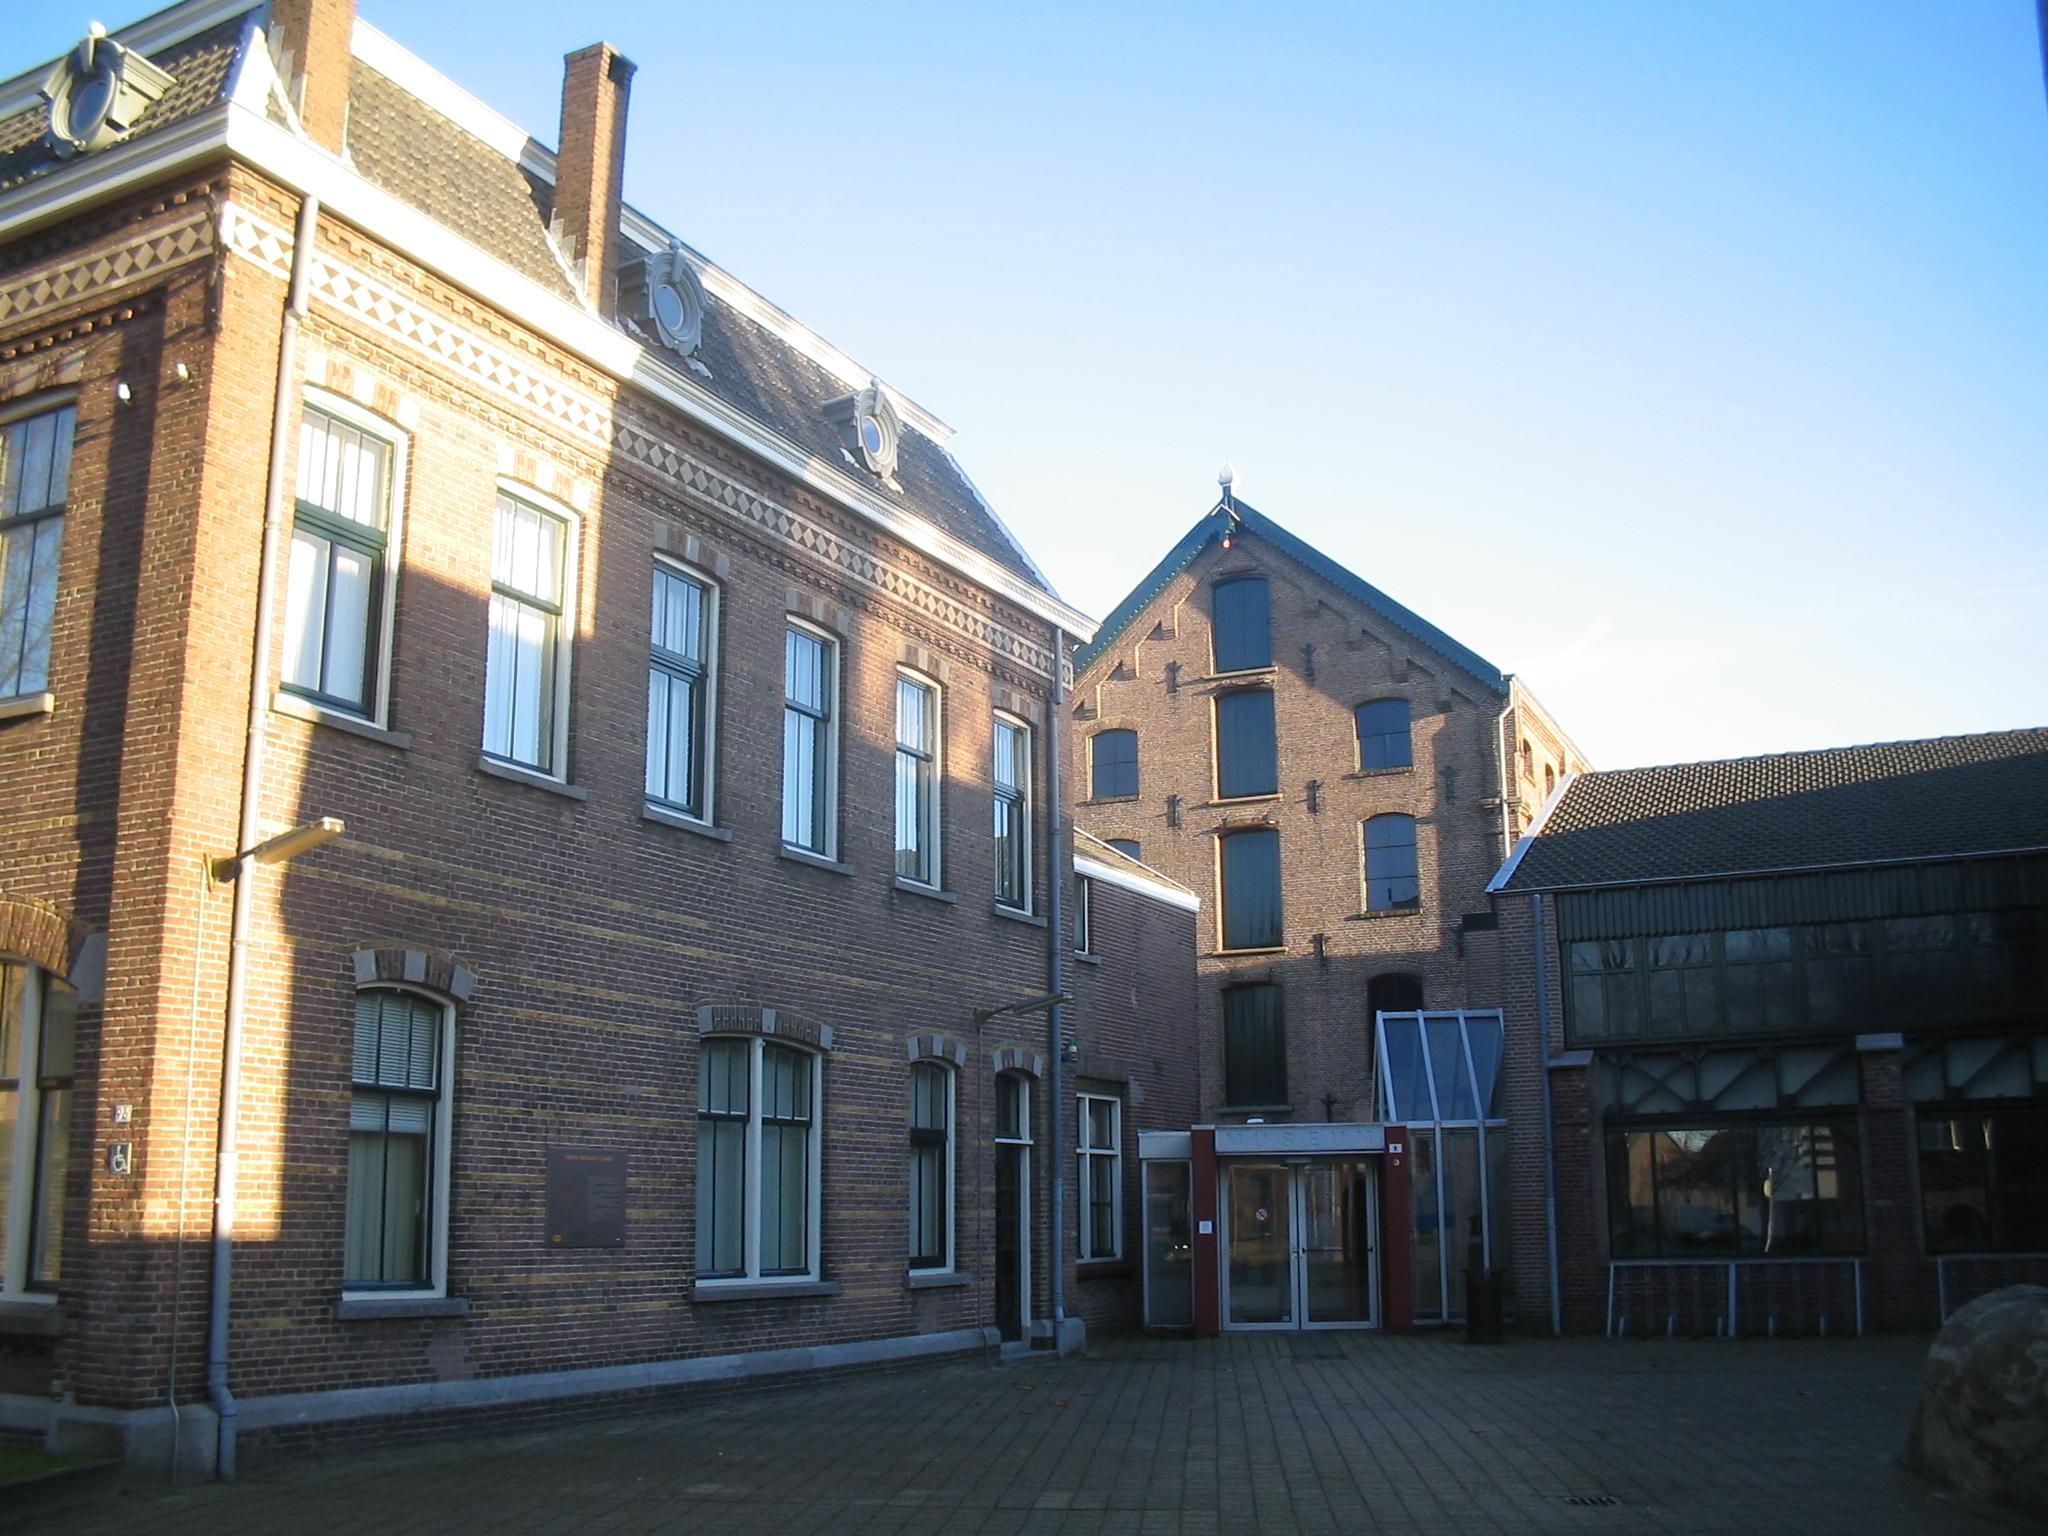 TextielMuseum Tilburg, 2005